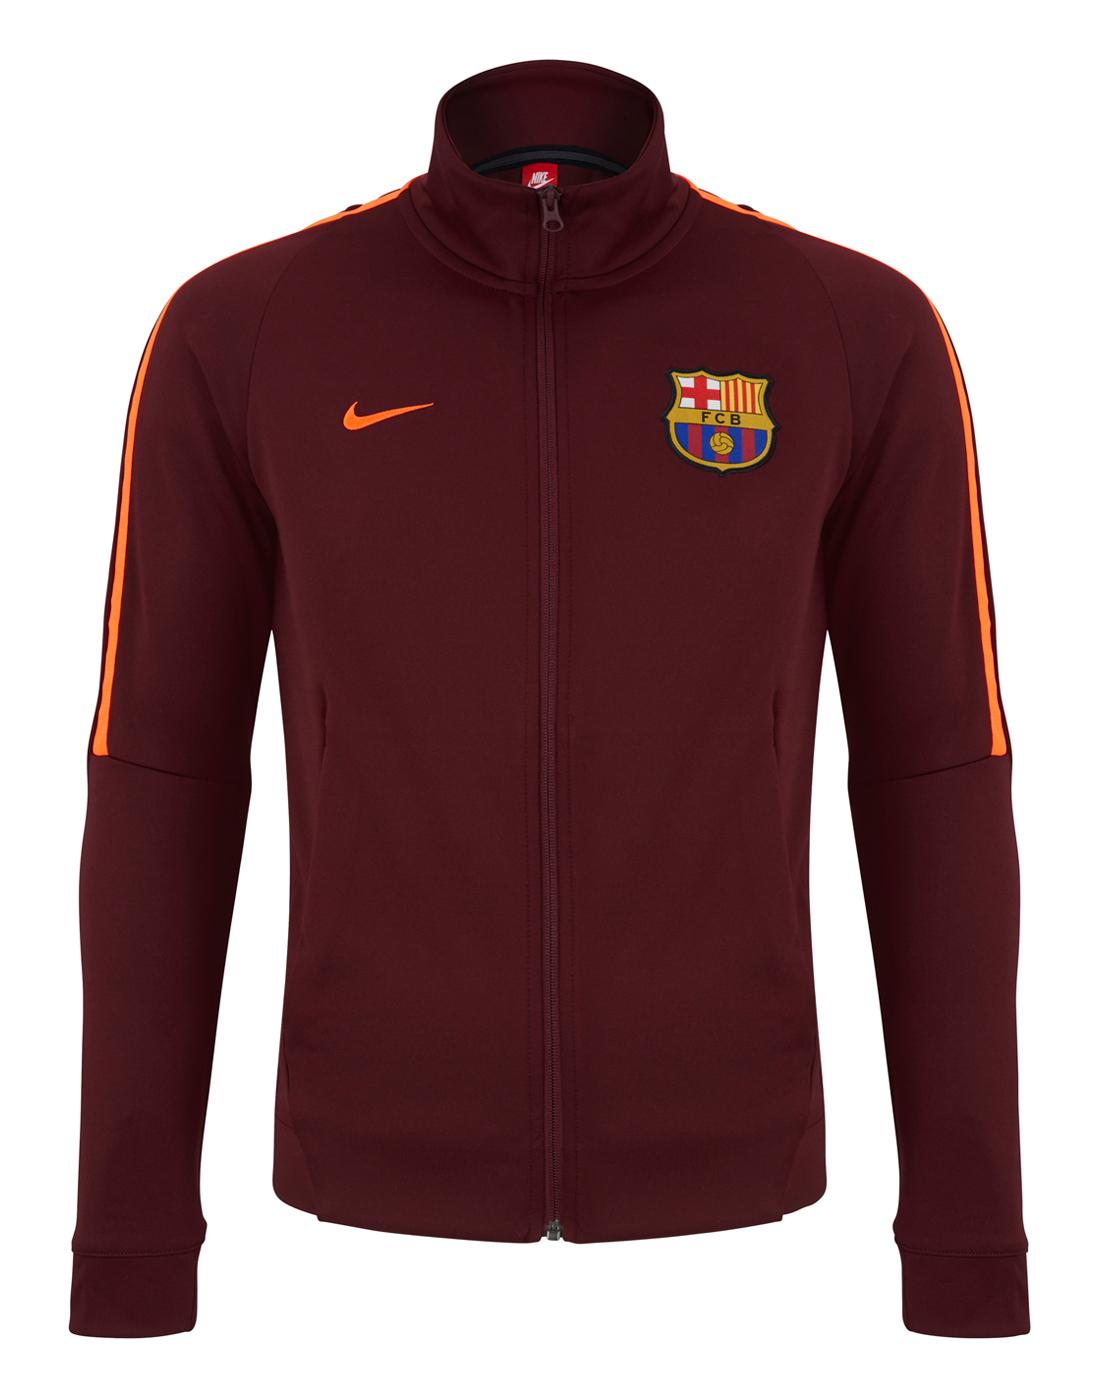 b8510a72 Nike Adult Barcelona 17/18 N98 Jacket | Life Style Sports